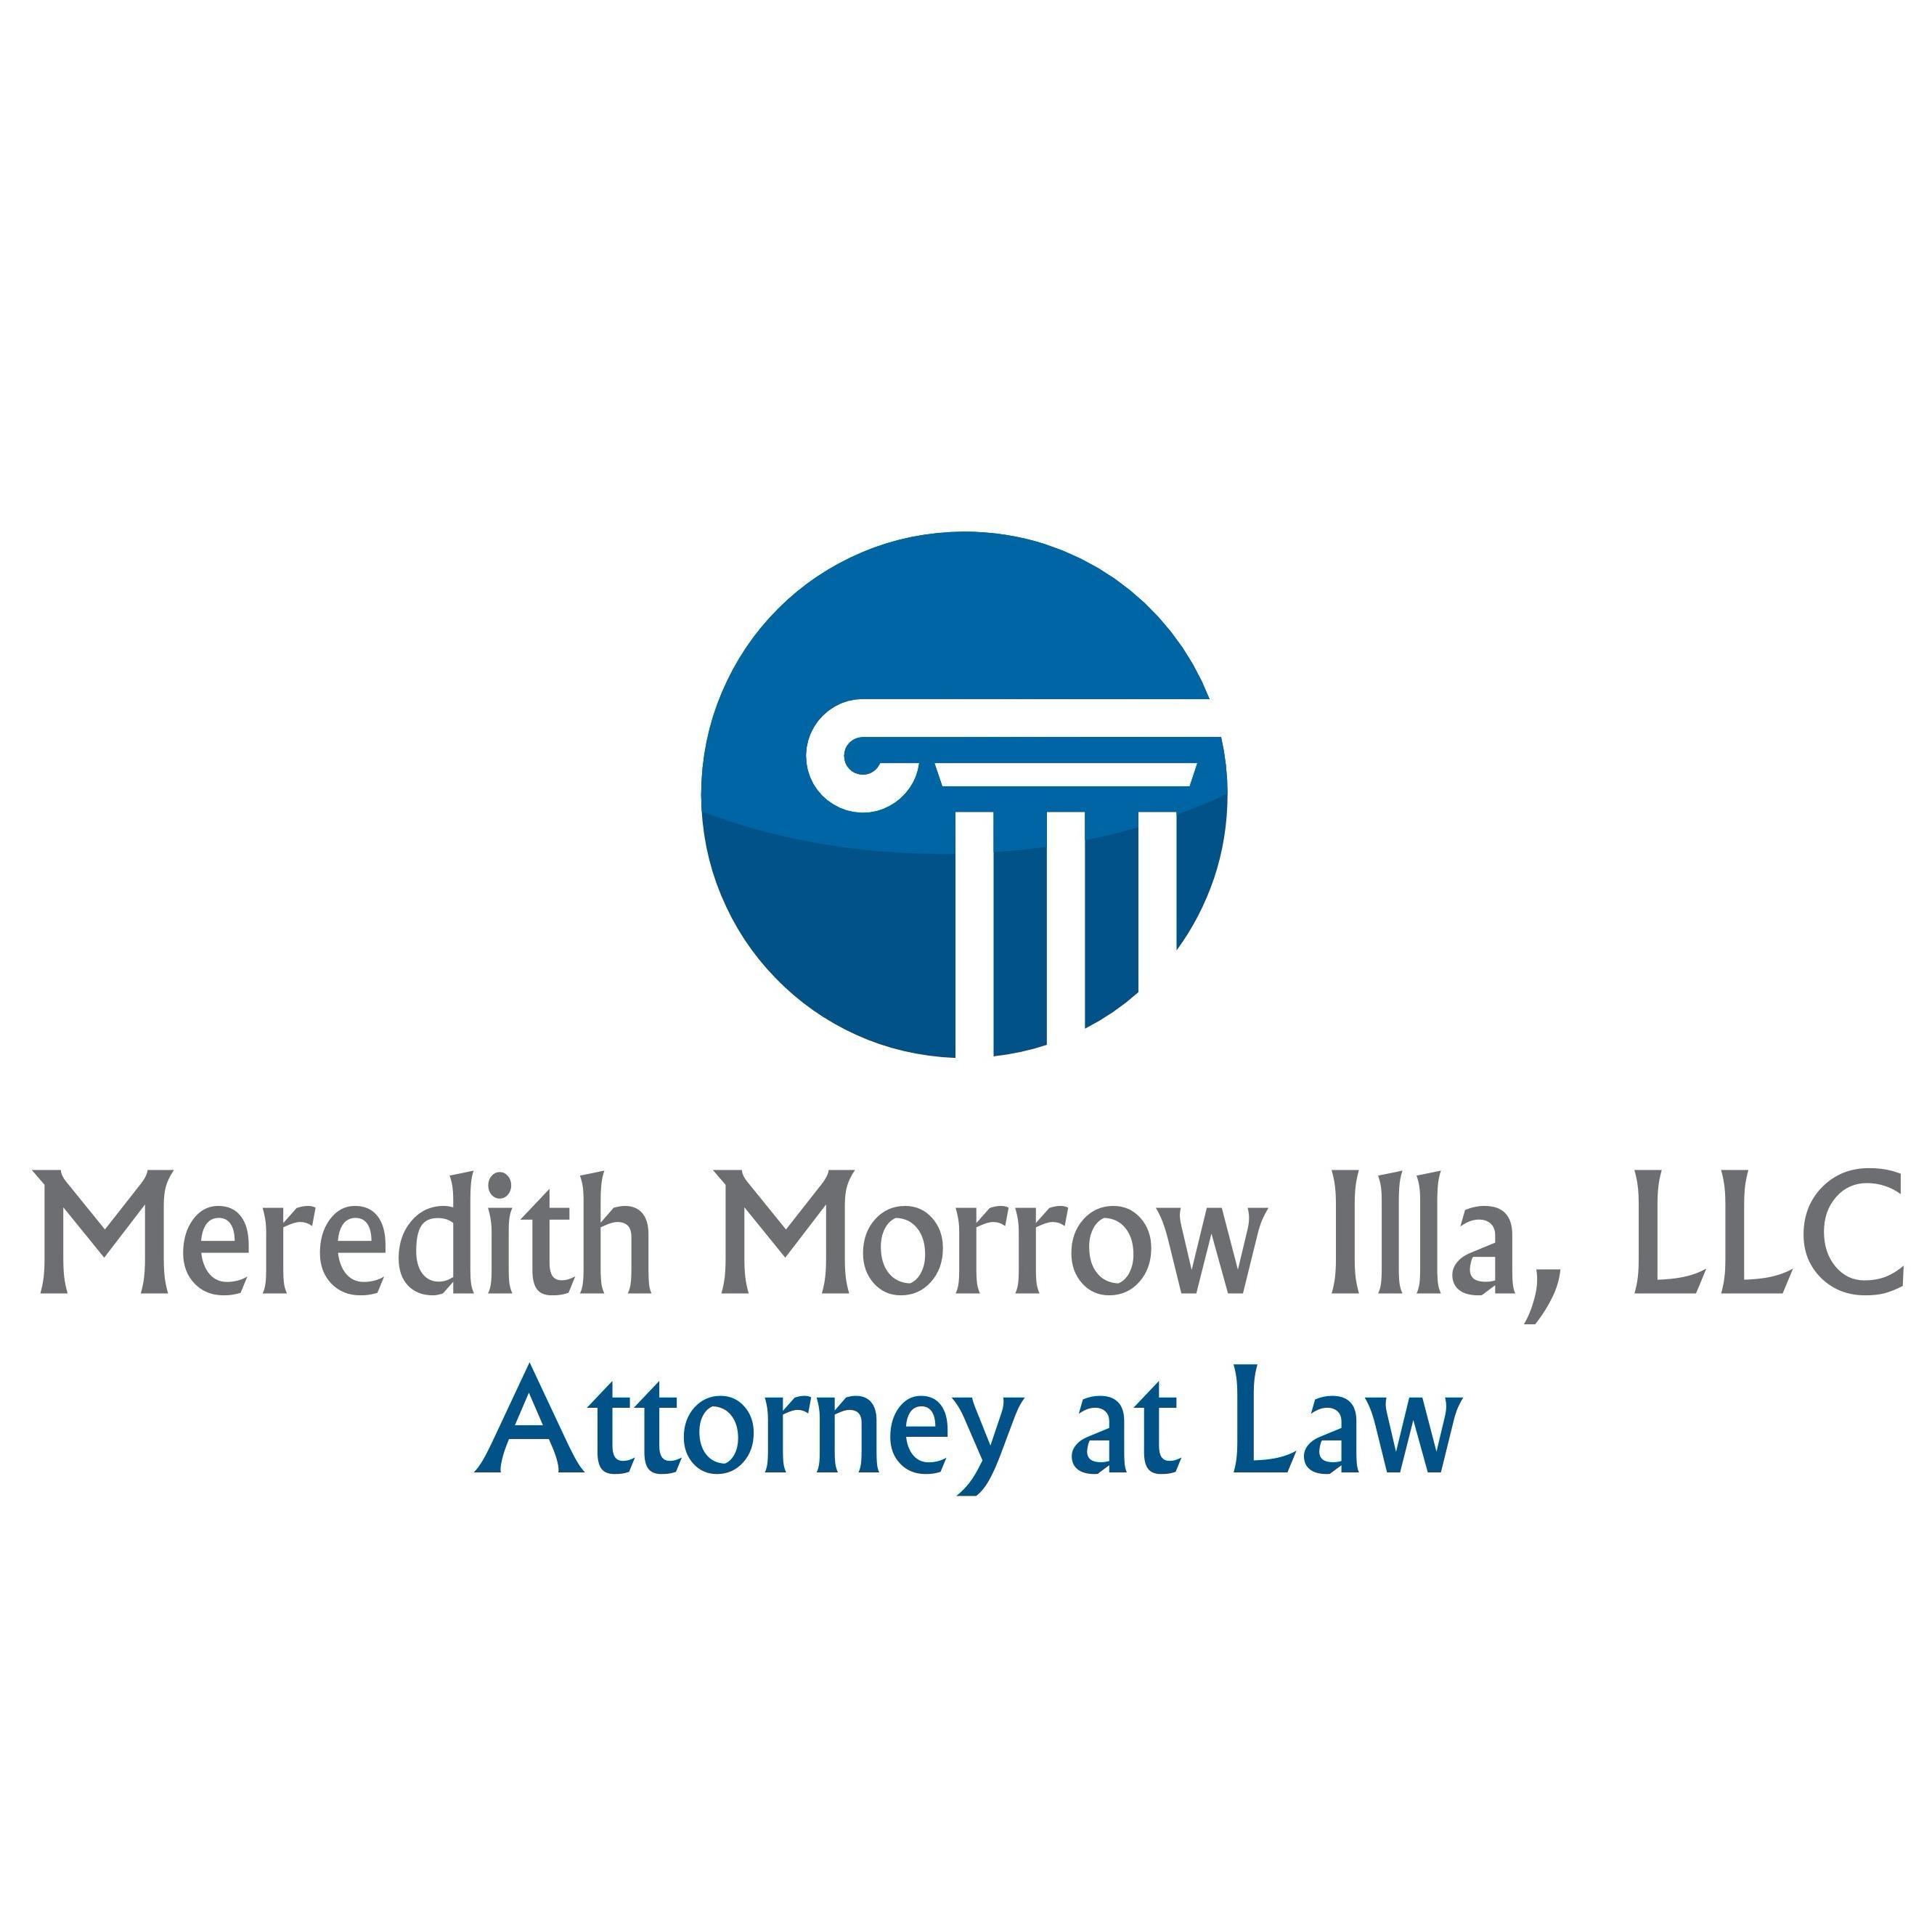 Meredith Morrow Illa, Attorney At Law